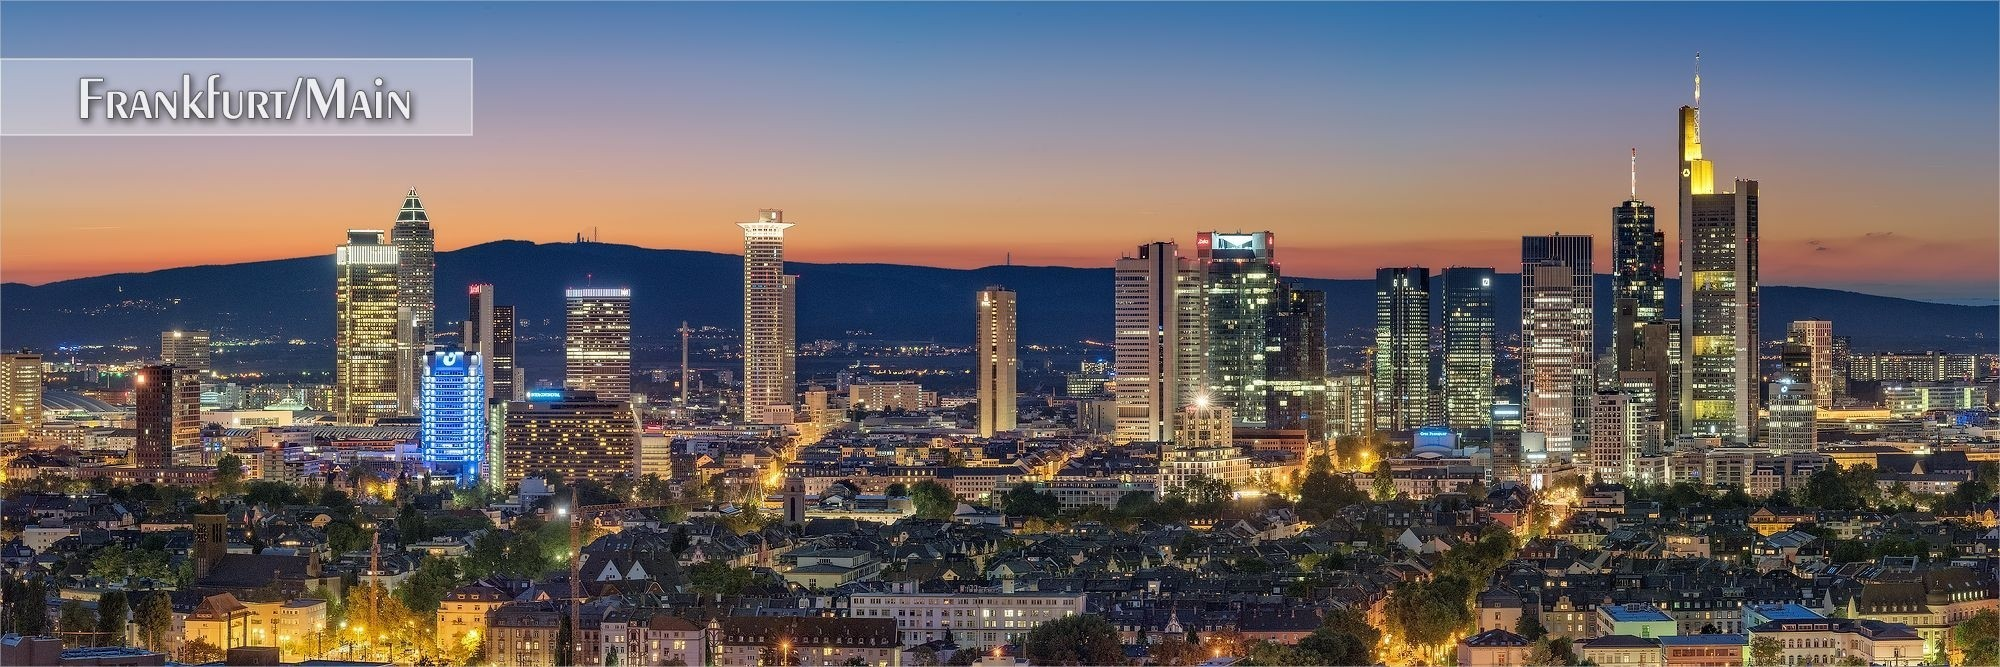 Bilder aus Frankfurt/Main als Wandbild oder Küchenrückwand